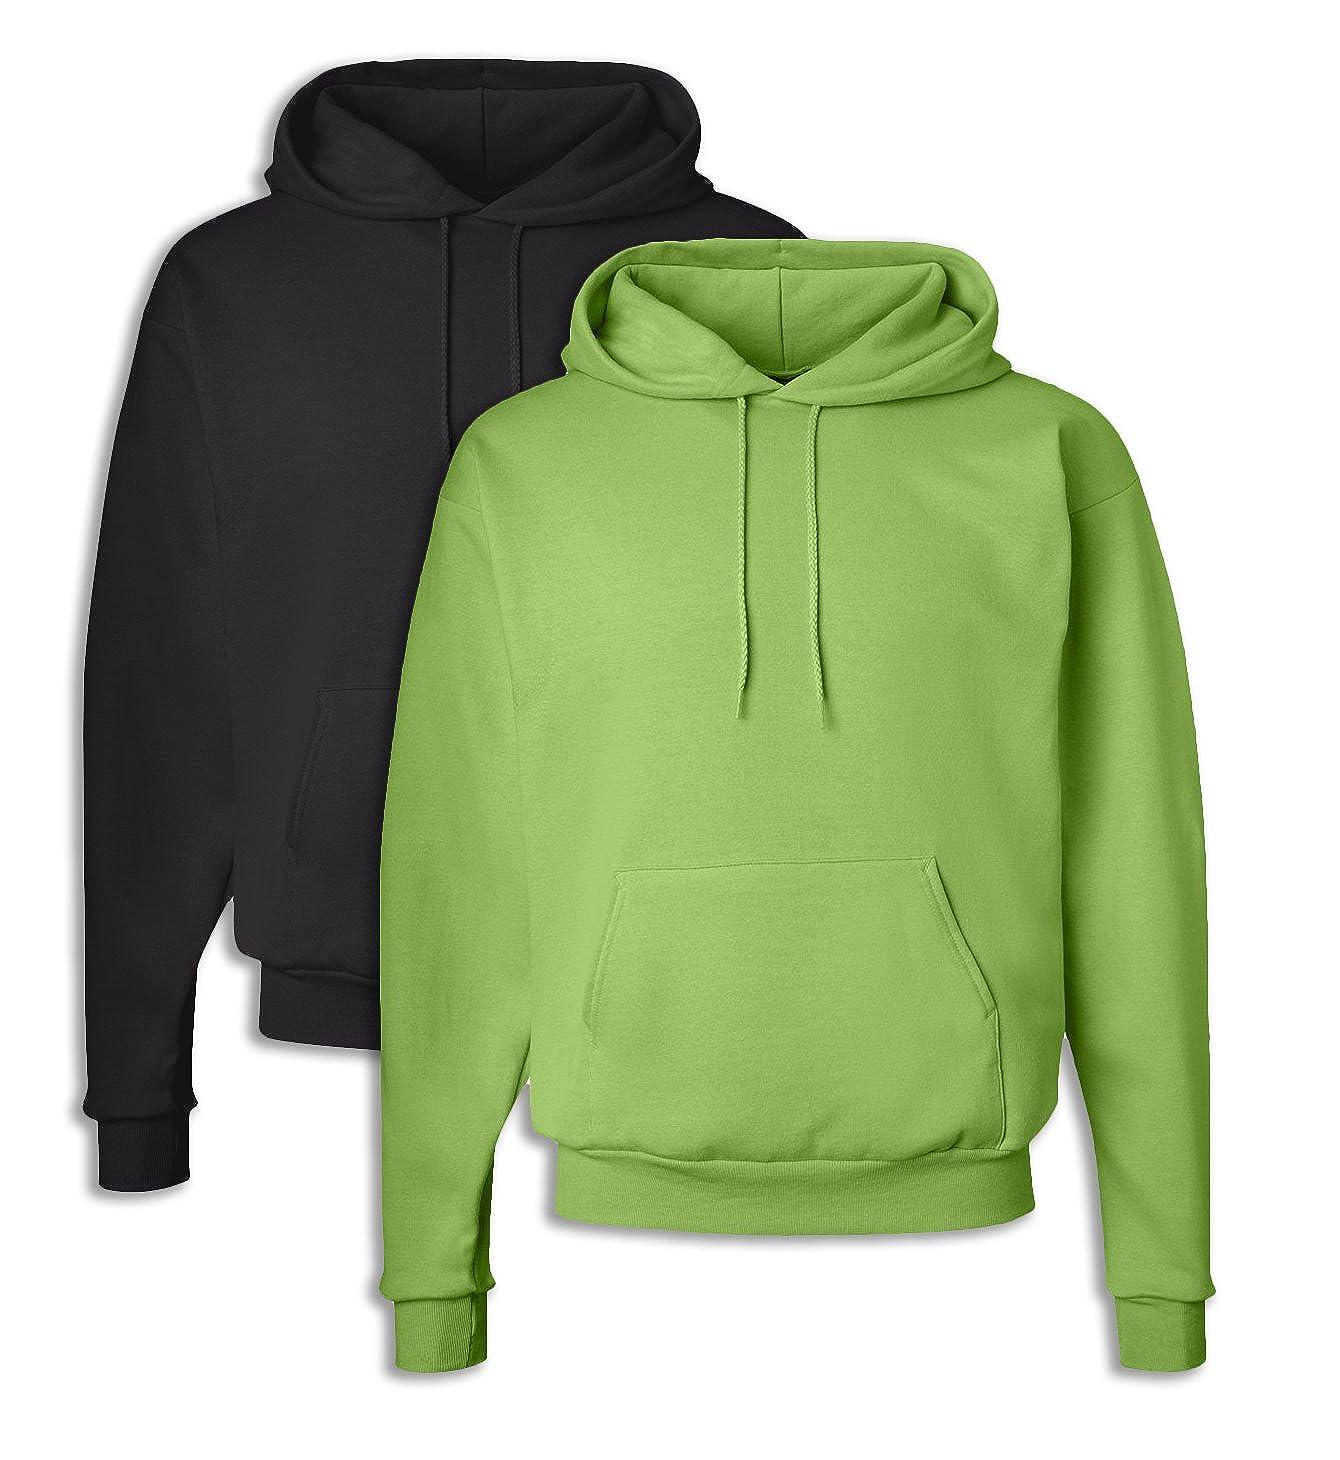 1 Lime Hanes Mens EcoSmart Hooded Sweatshirt 3XL 1 Black